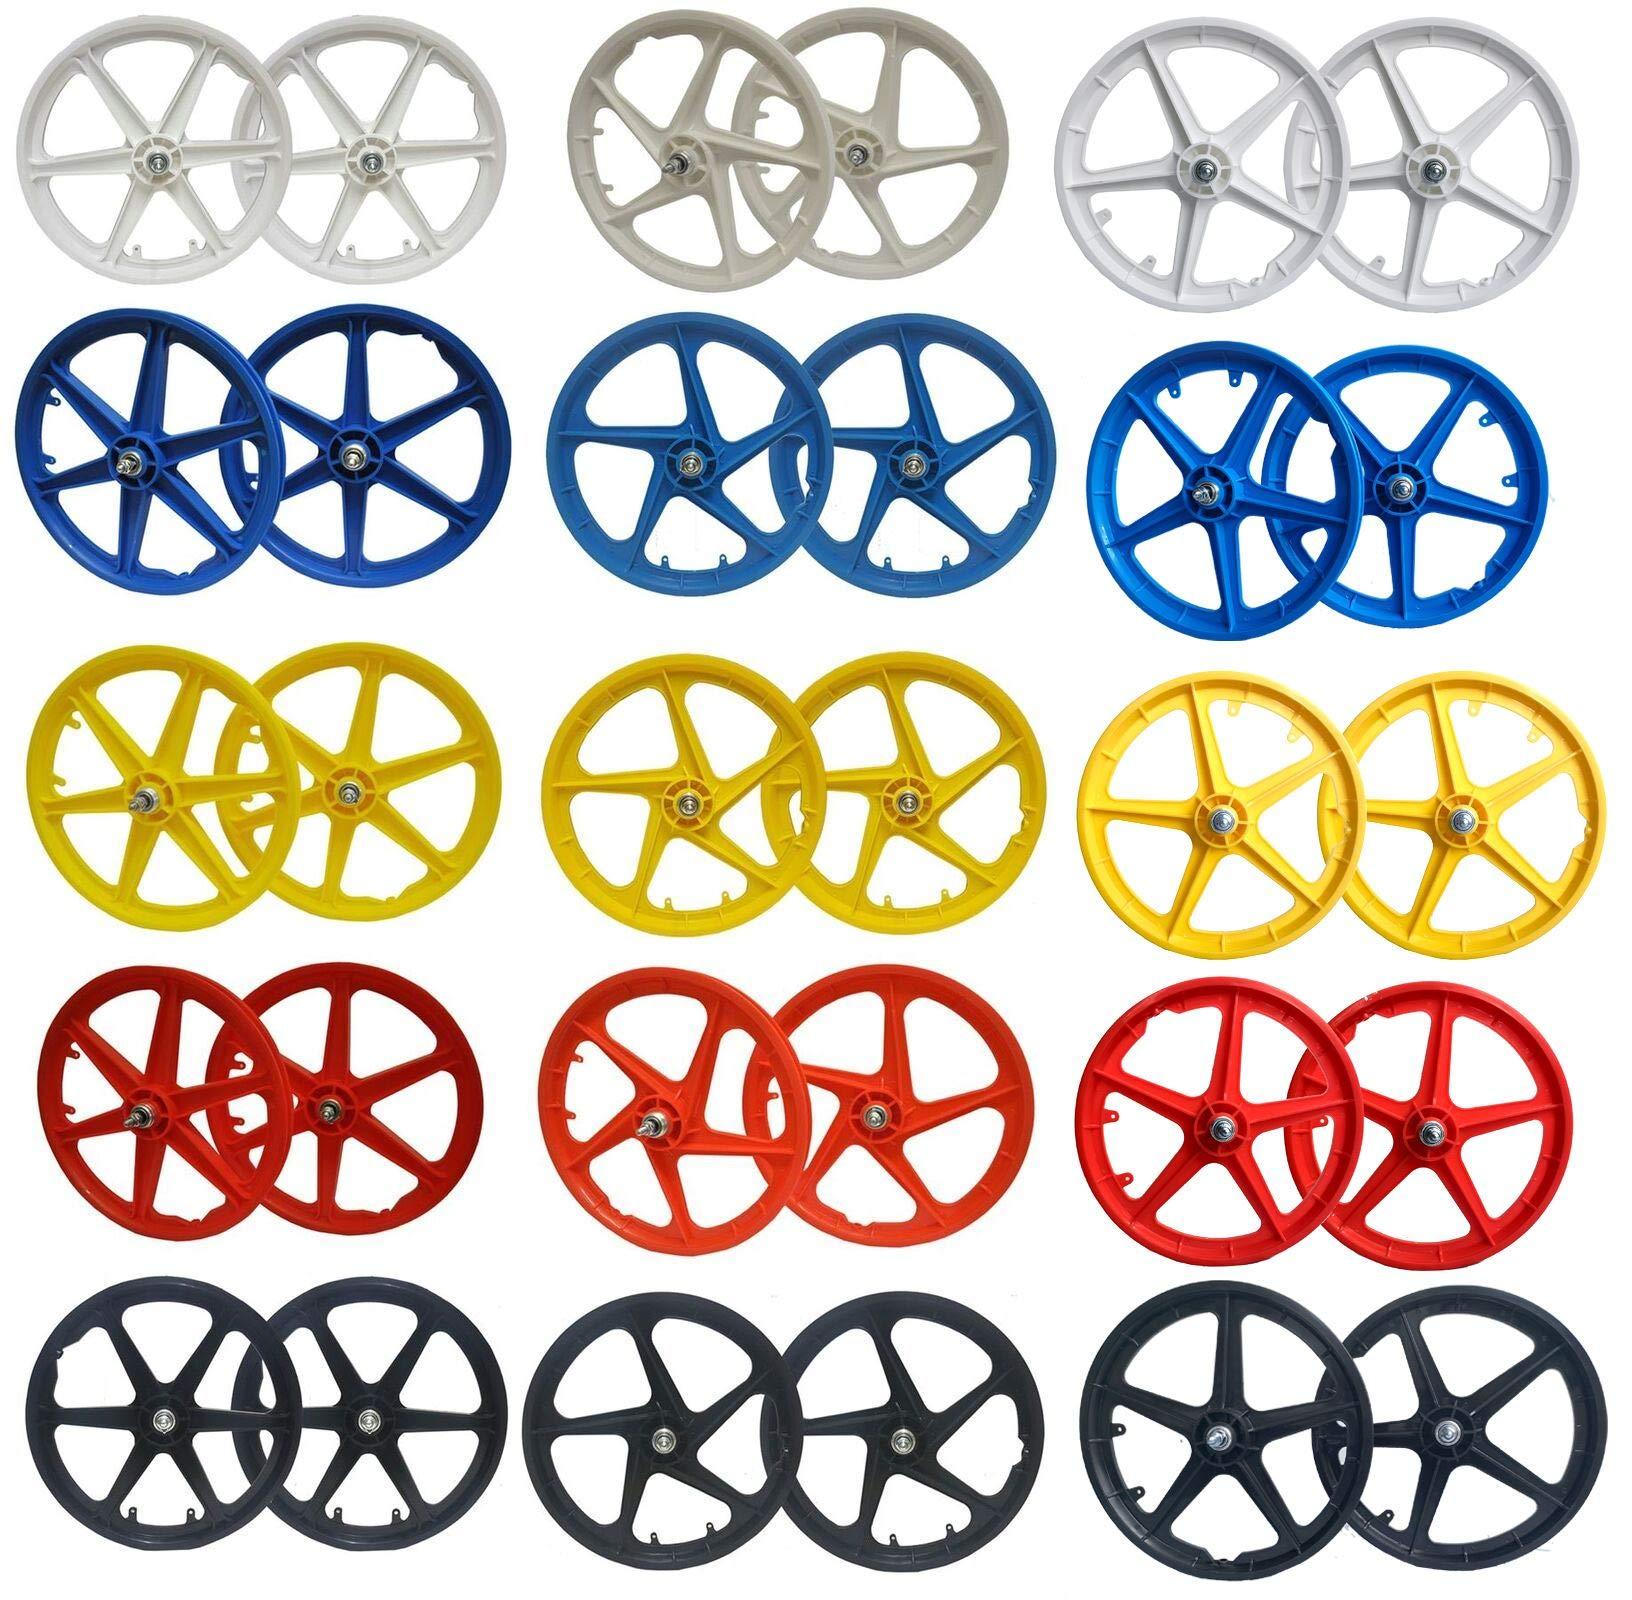 "TRINITY 20"" BMX Mag Wheels Front Rear 5 Spoke or 6 Spoke & Aero Designs Freestyle Wheel Sets"